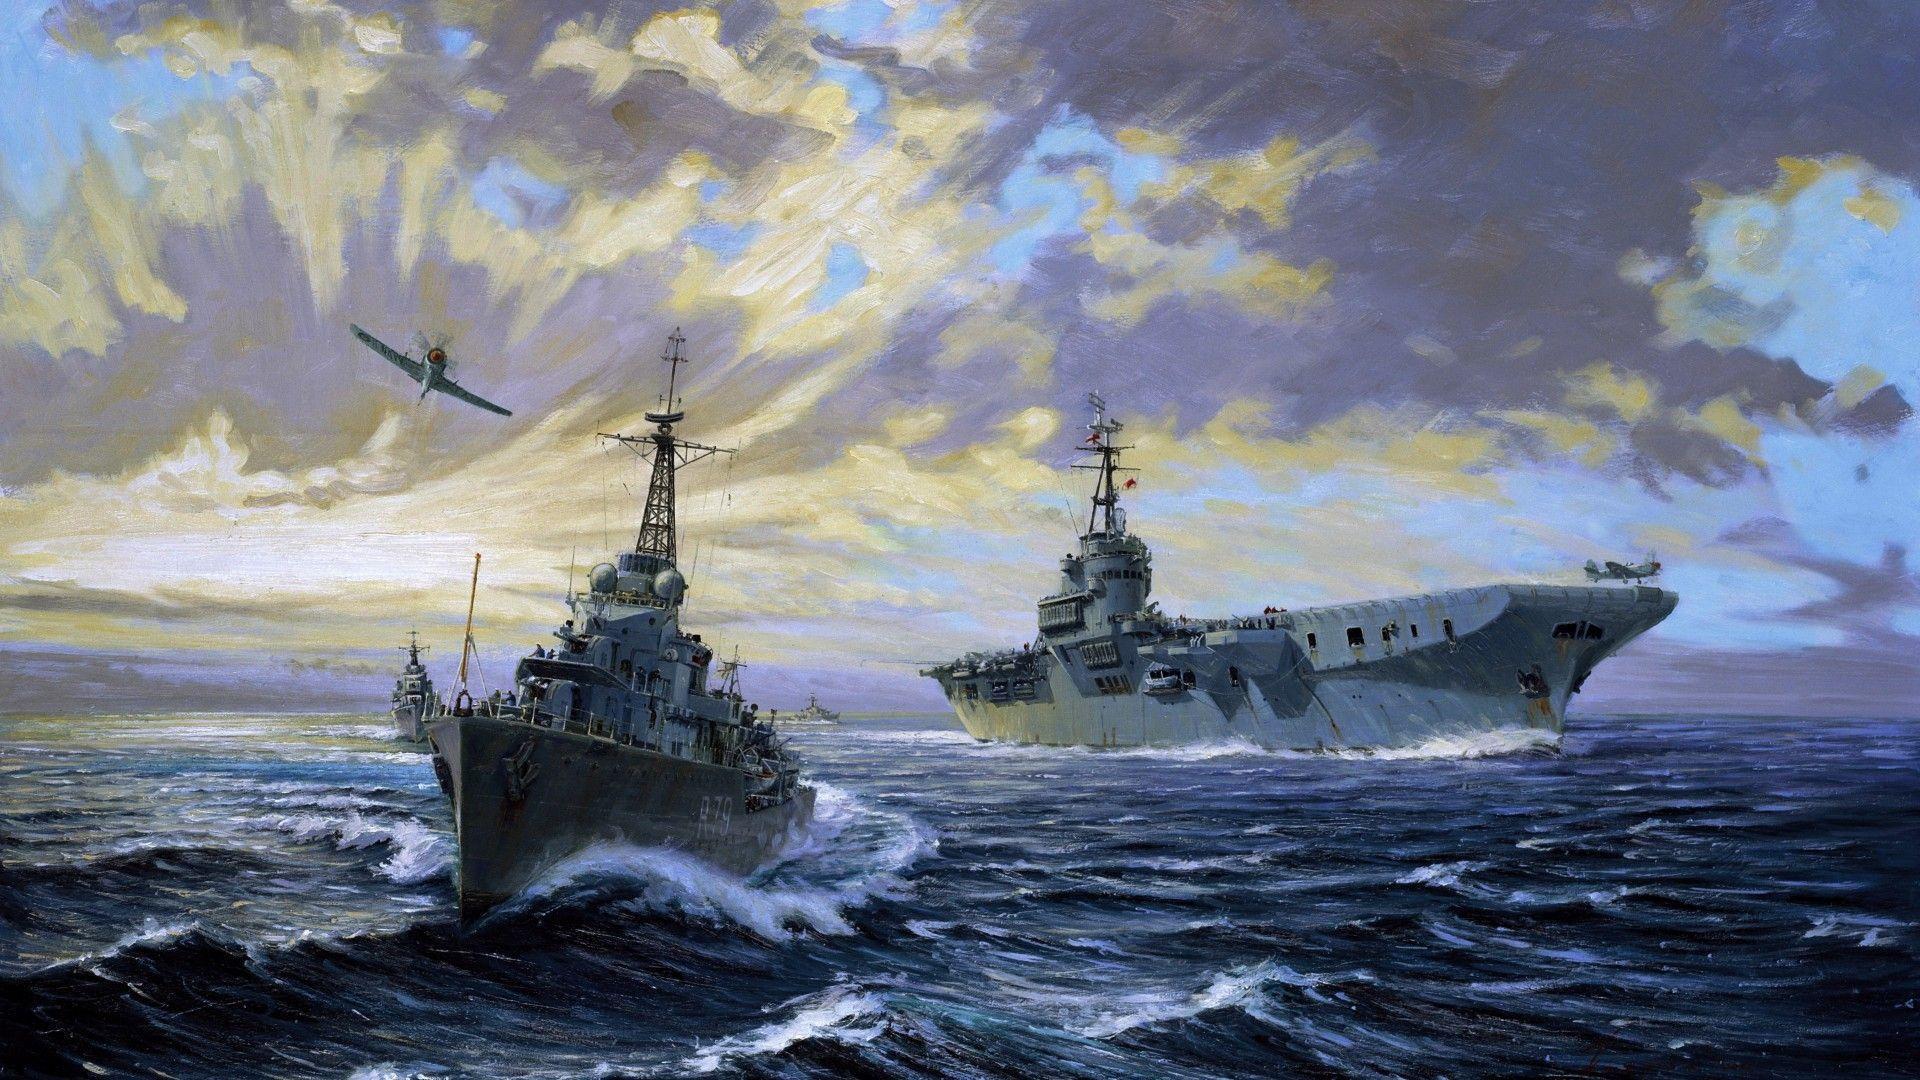 Hd Navy Ship Wallpapers